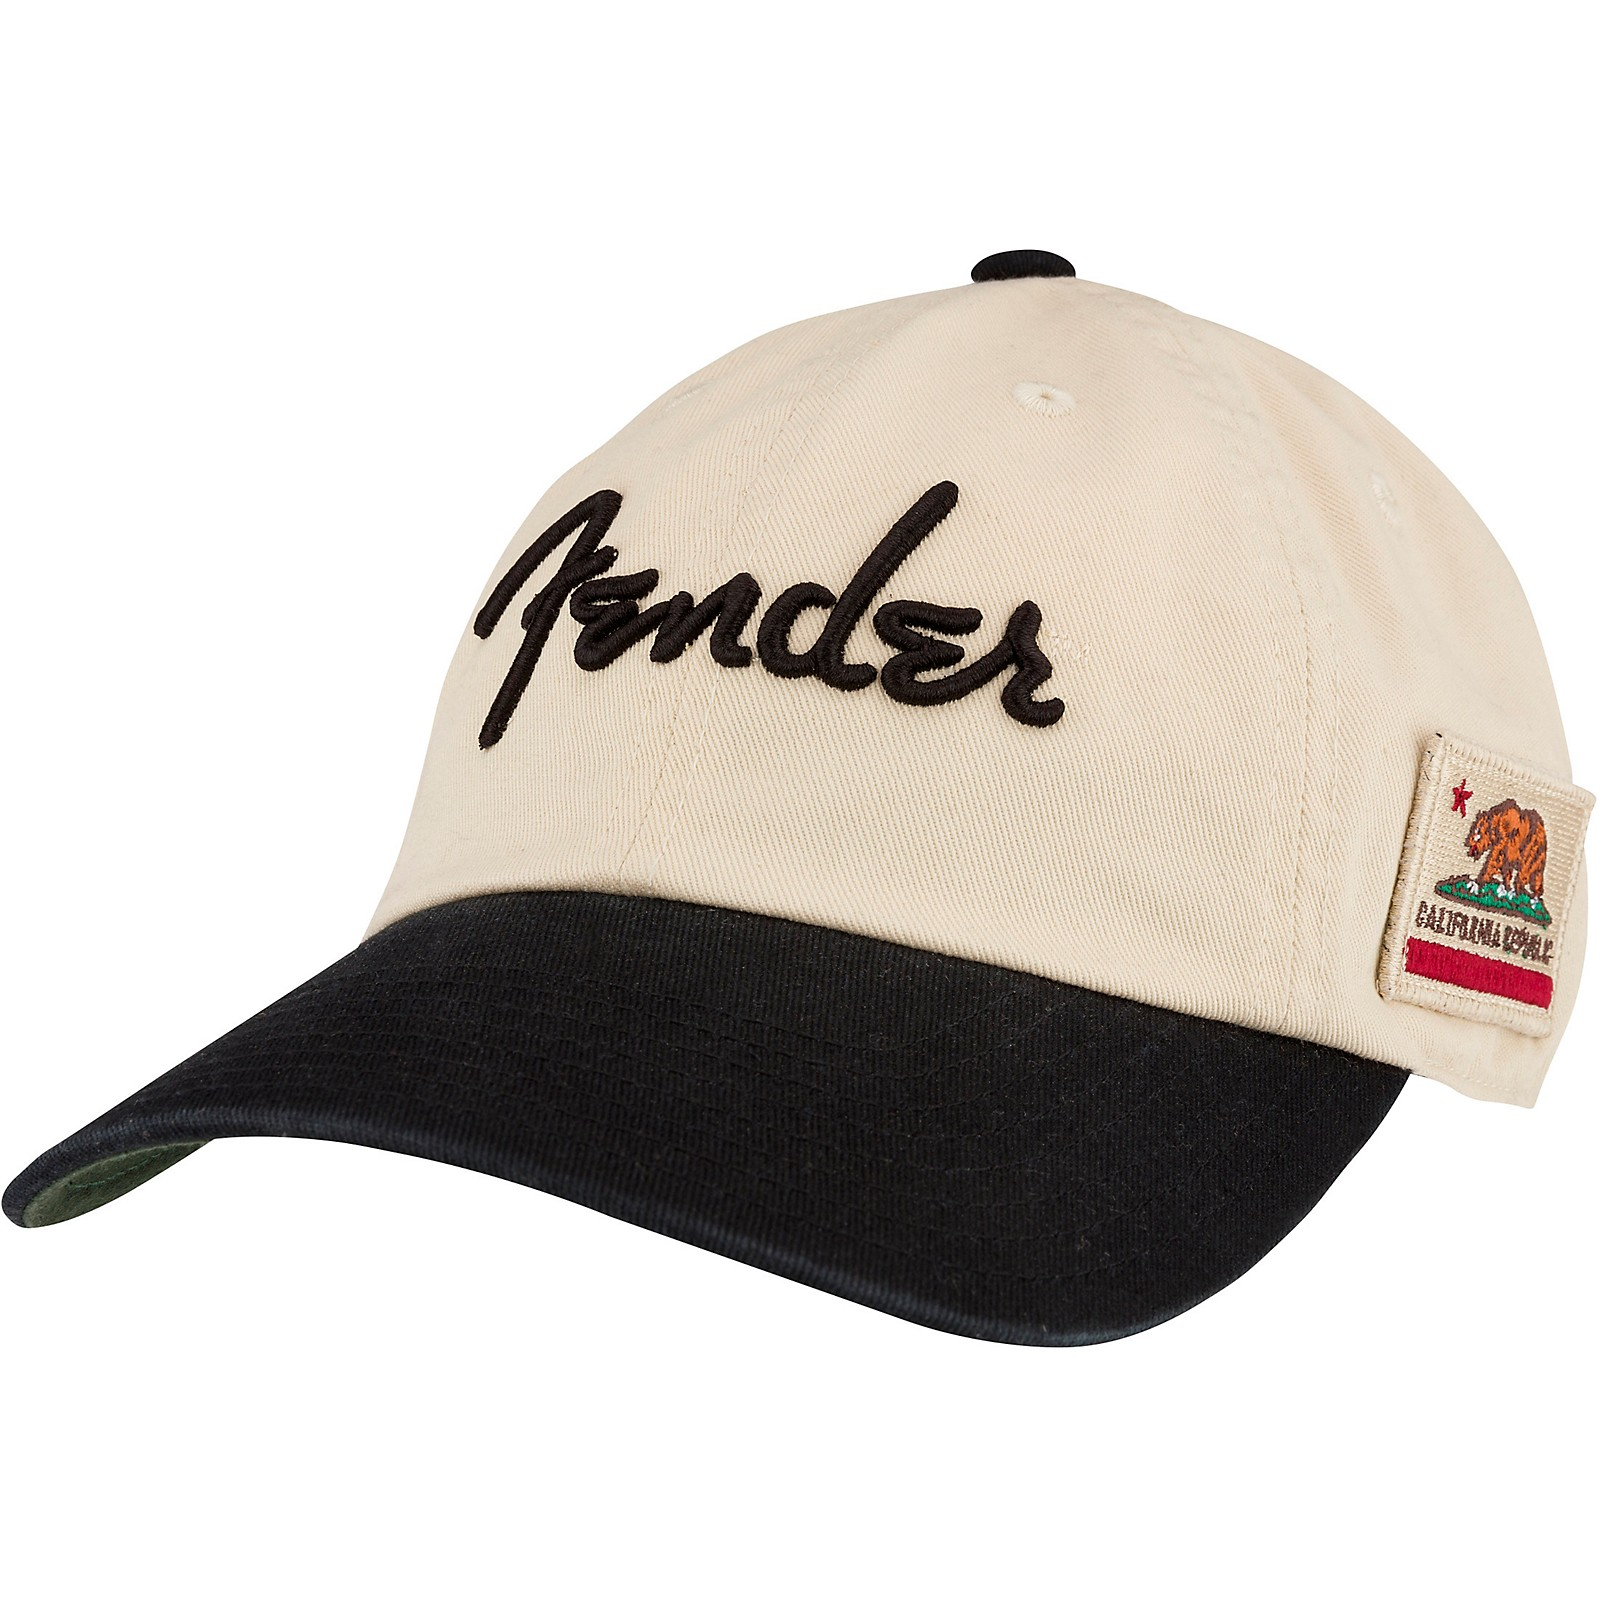 Fender United Slouch Hat